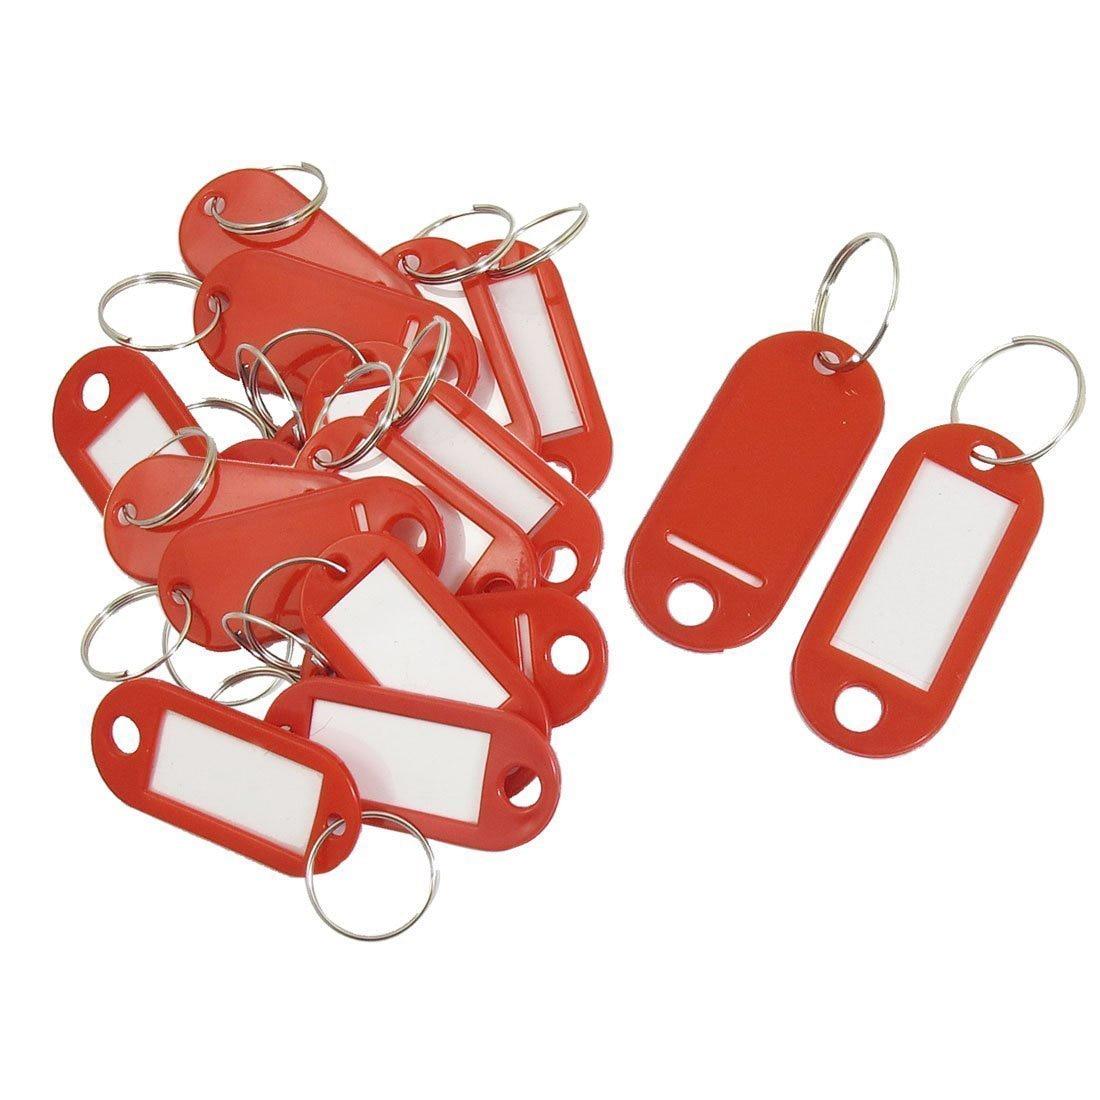 VSEN/20 шт. Ассорти Ключ ID Метки Разделение кольцо брелок для ключей